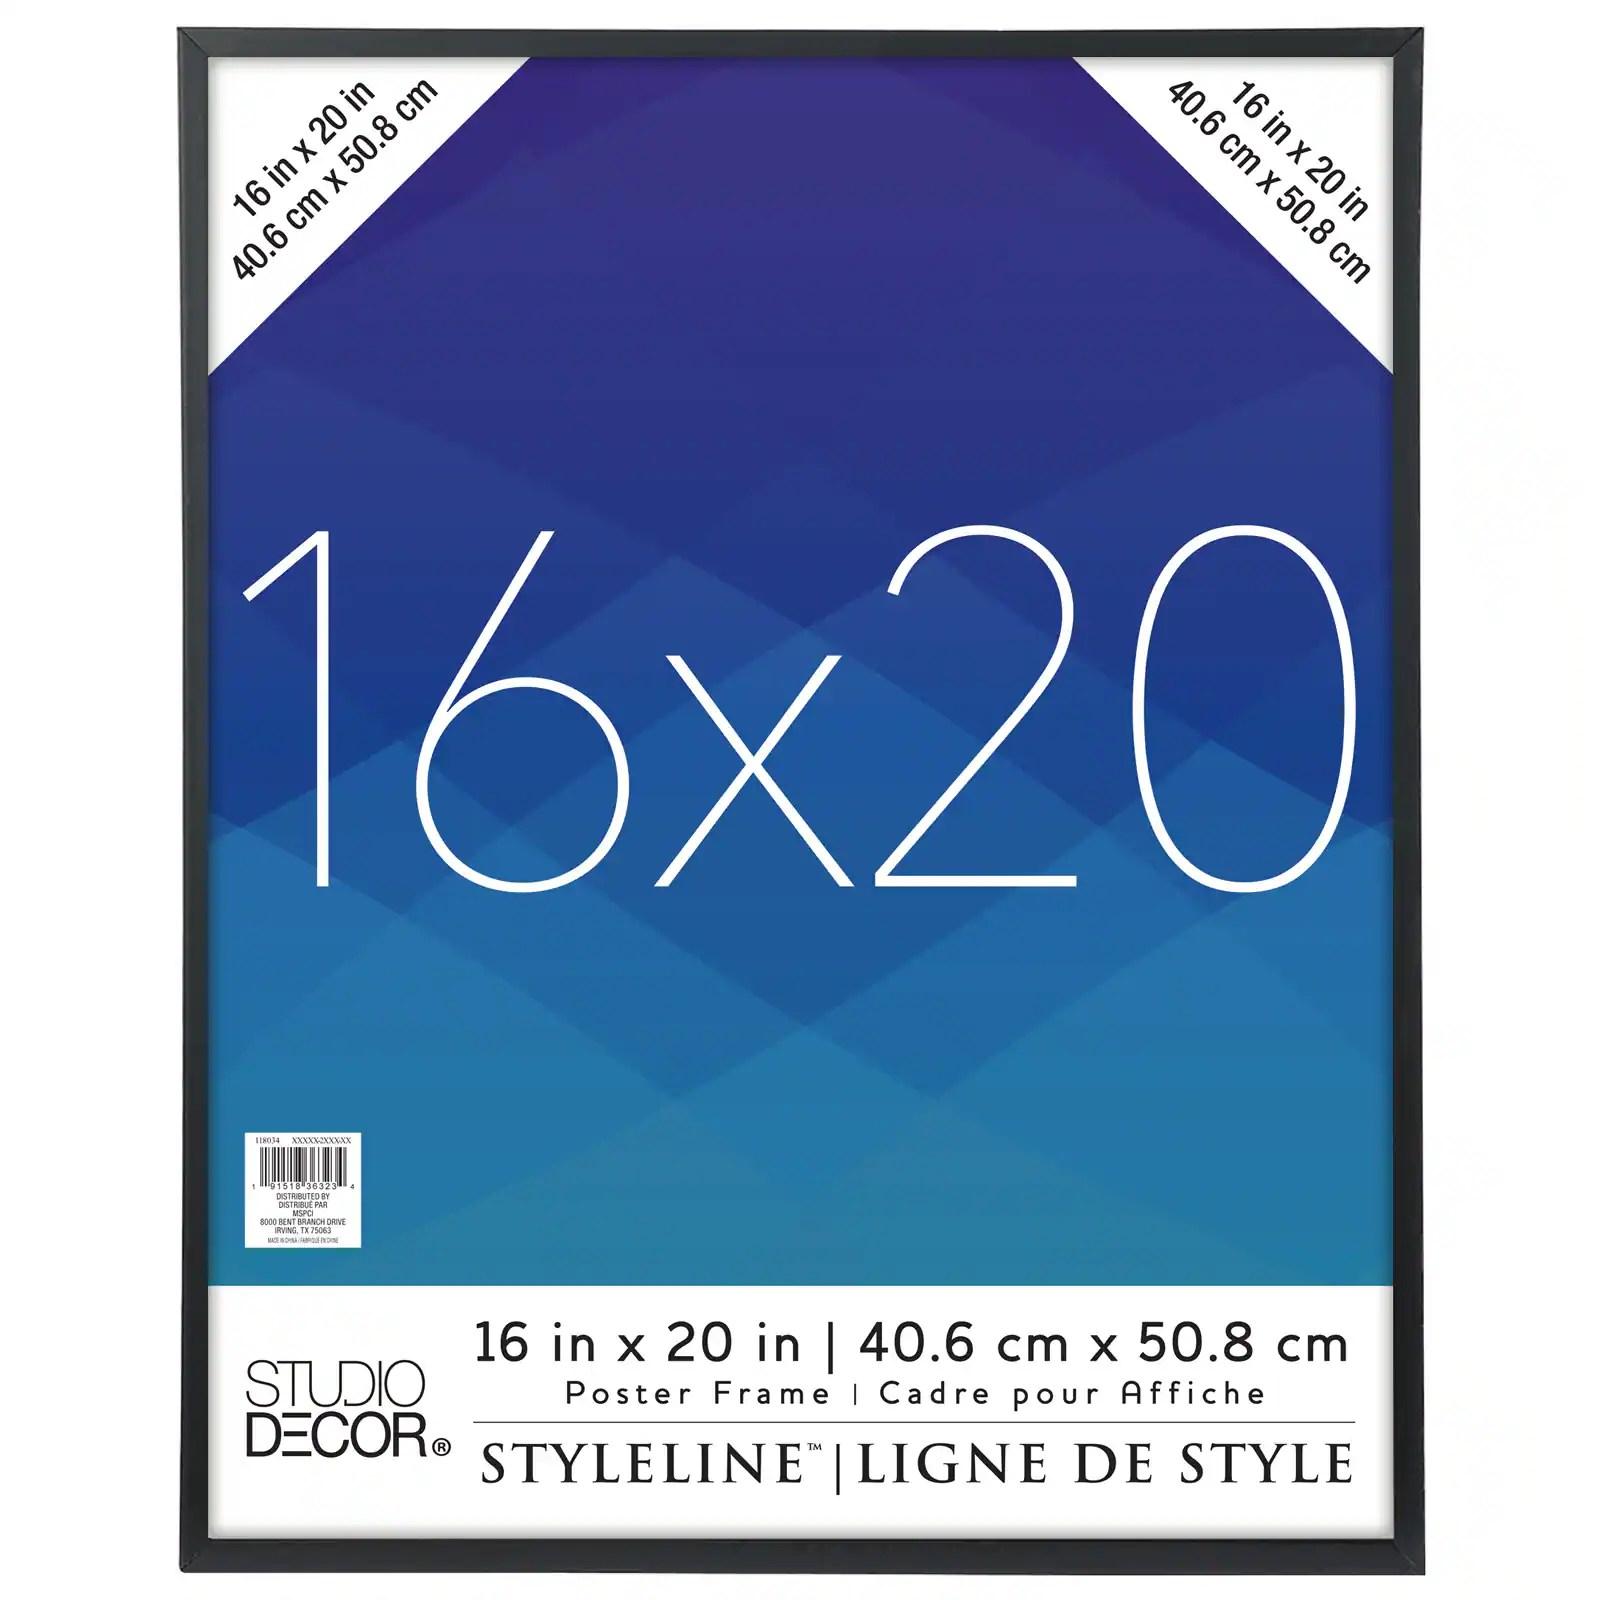 styleline poster frame by studio decor